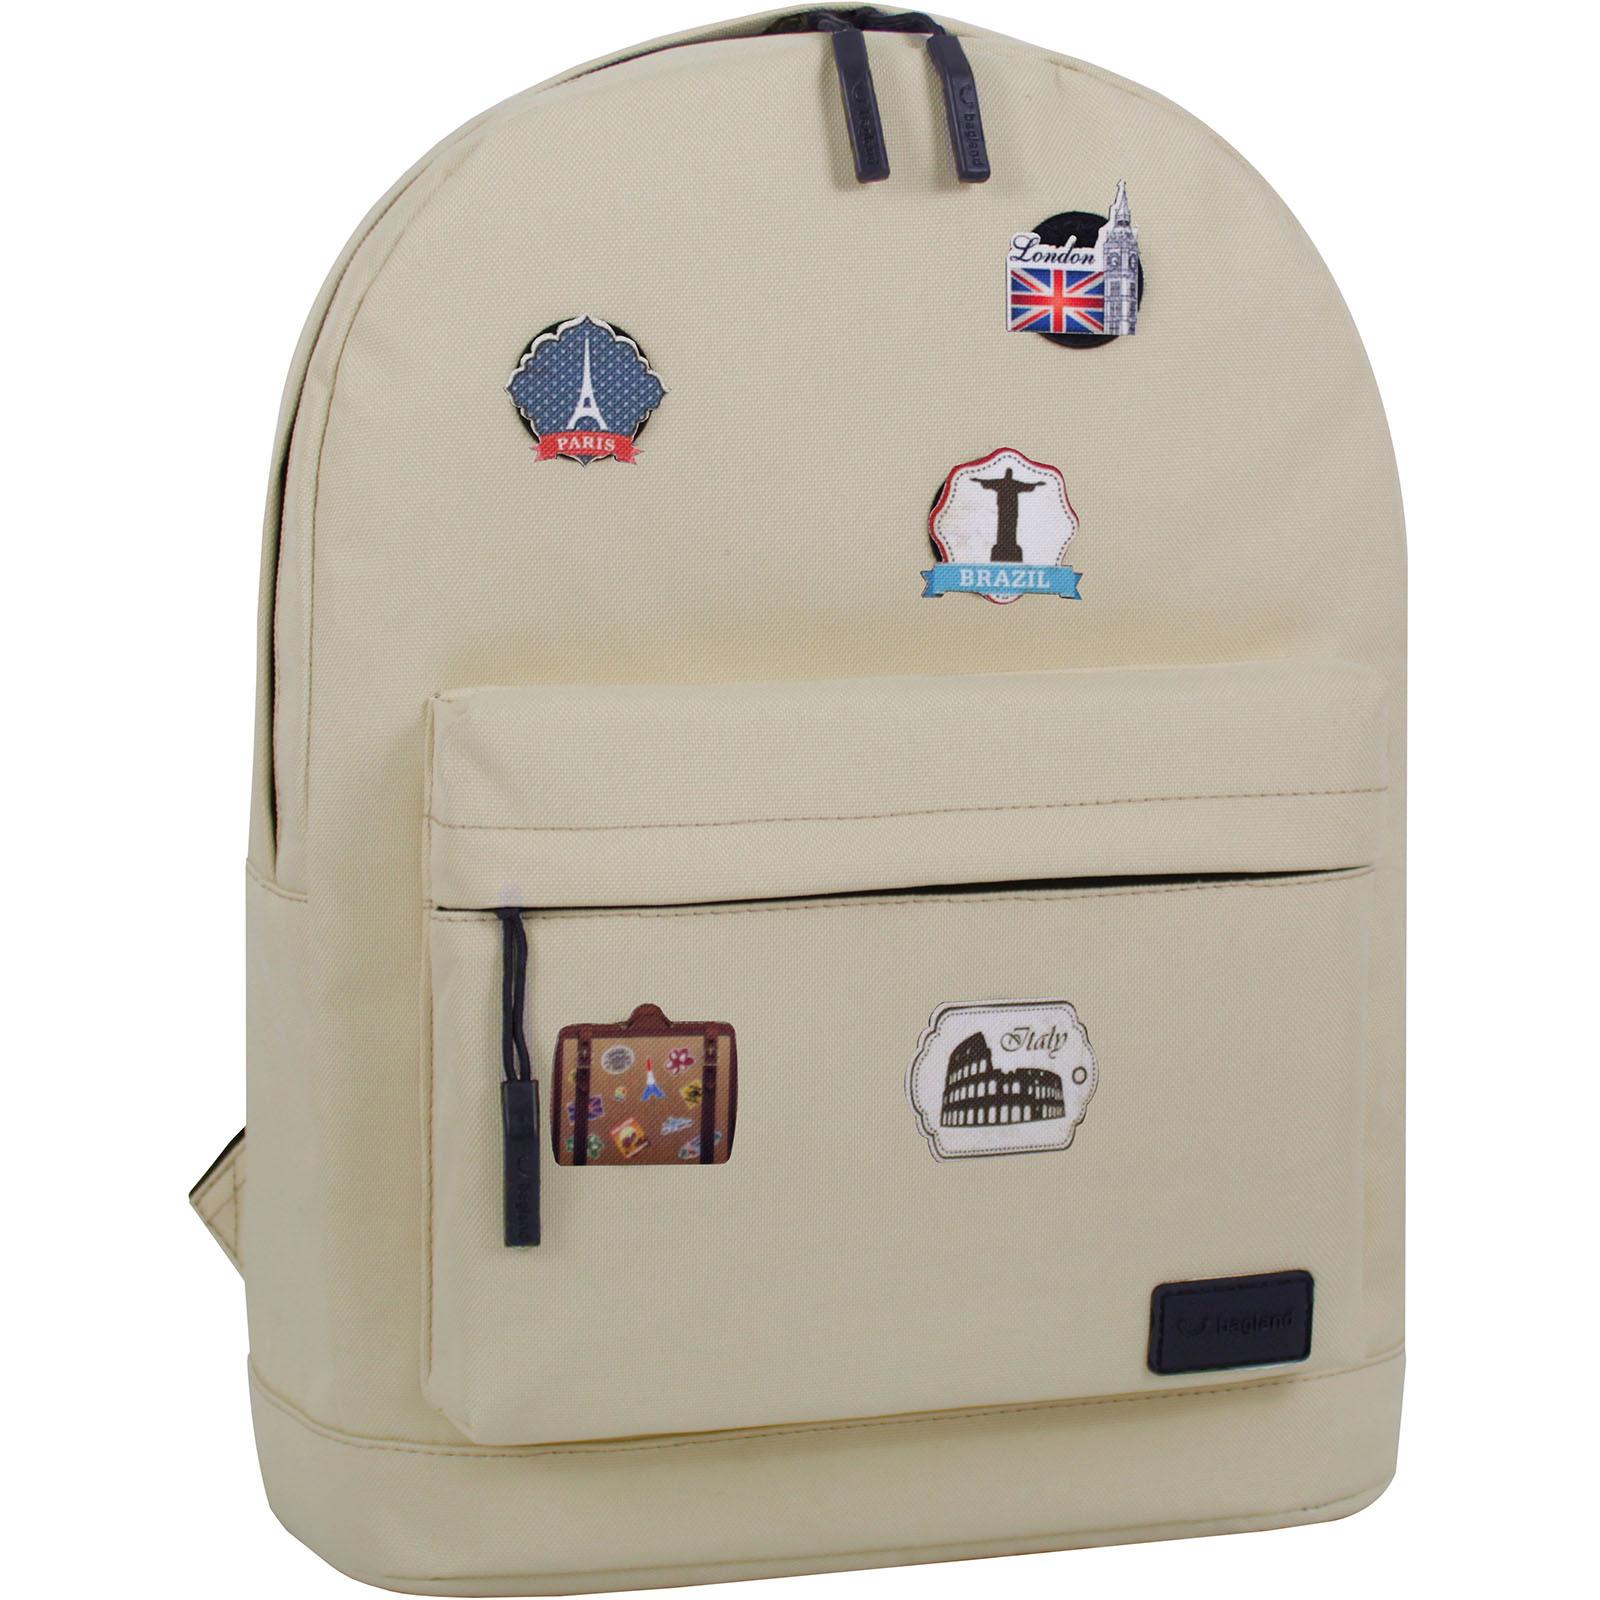 Городские рюкзаки Рюкзак Bagland Молодежный W/R 17 л. 276 бежевый (00533662 Ш) IMG_3152.JPG